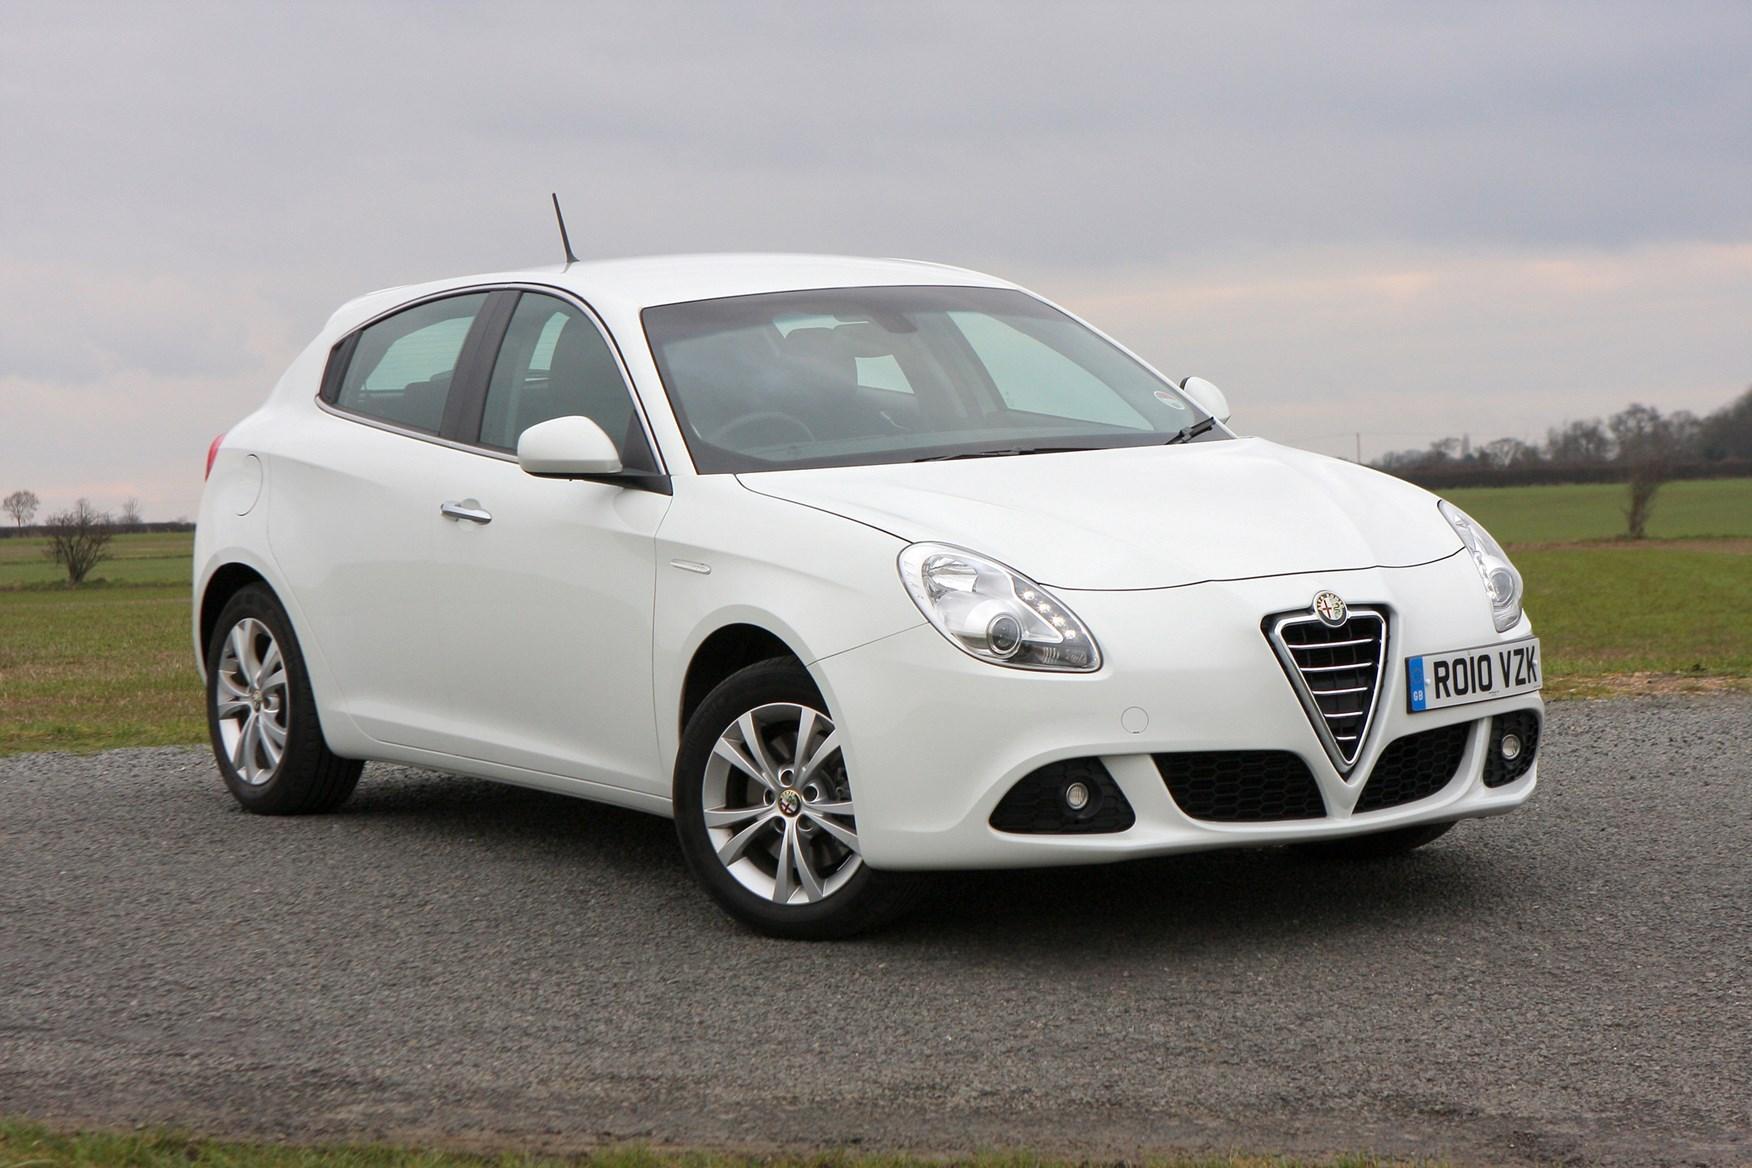 Alfa Romeo Giulietta Hatchback Review 2010